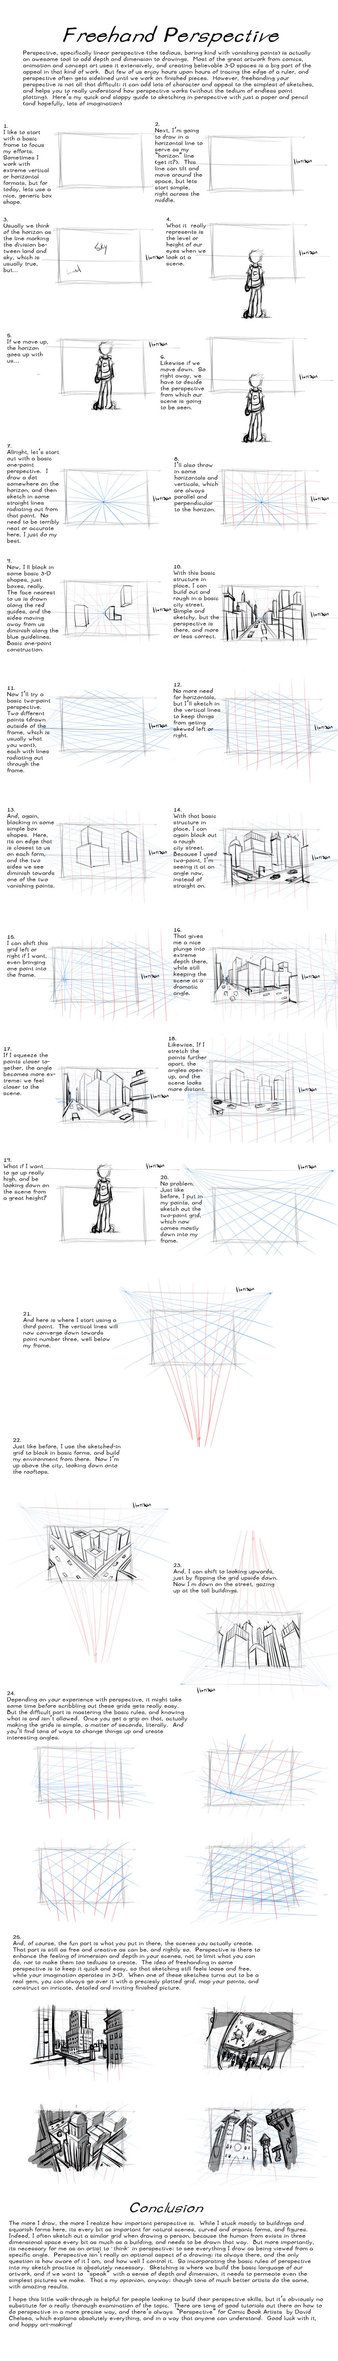 Freehand Perspective Drawing Tutorialby *Mahasiddha